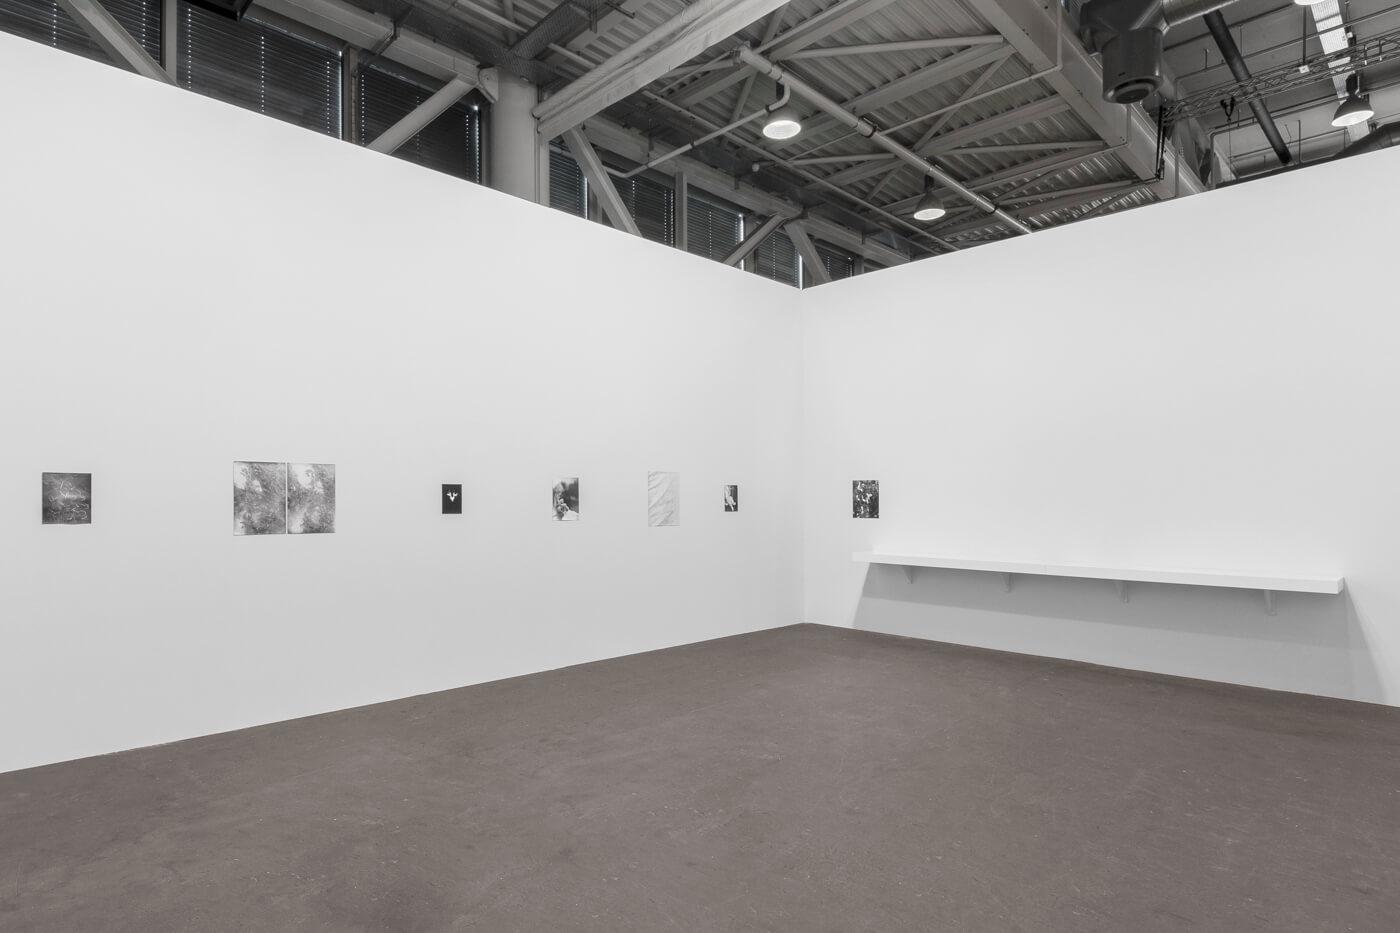 Installation view: Botanical Box, ProjecteSD, Art Unlimited   ART BASEL 2019   ProjecteSD